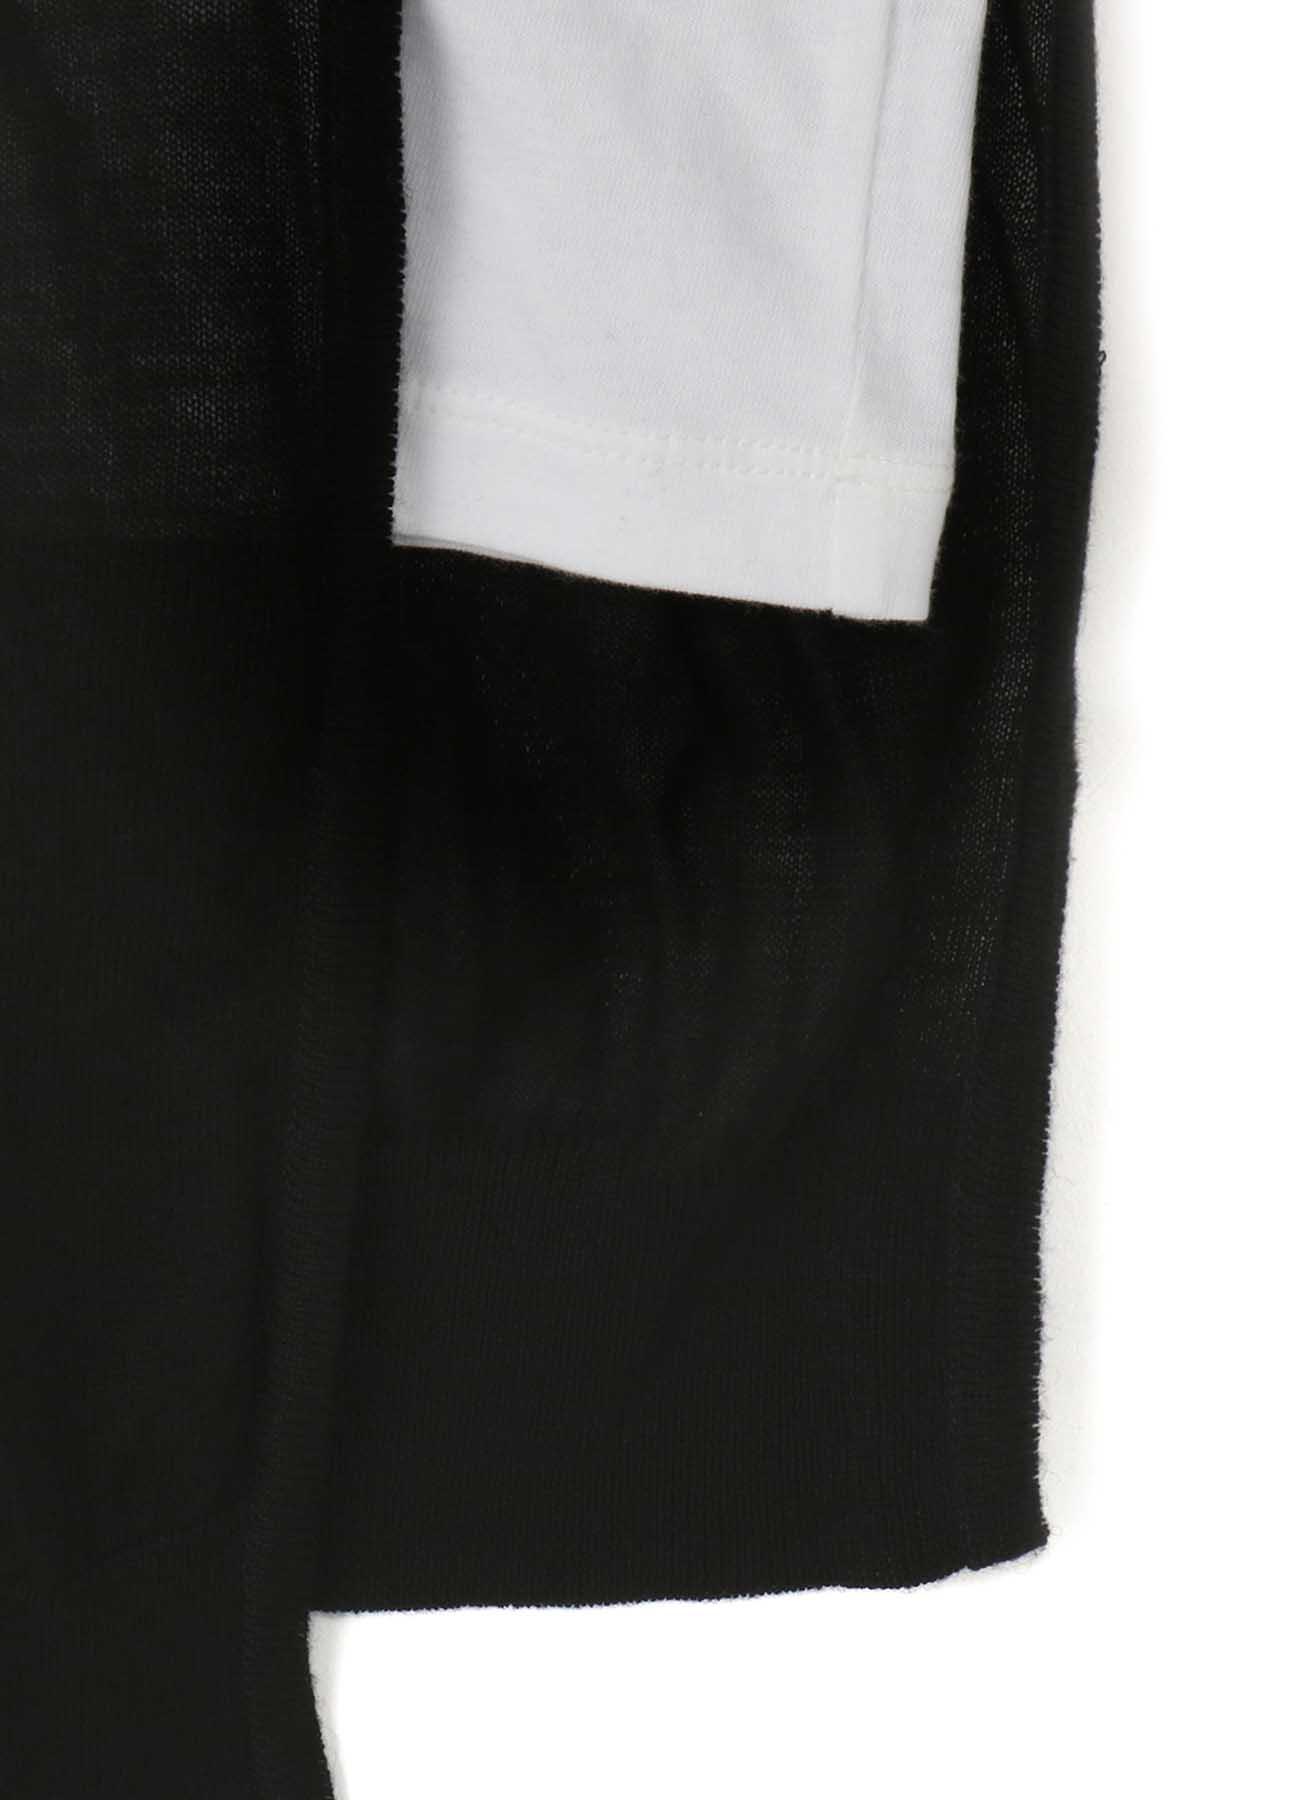 RISMATbyY's COTTON PLAIN STITCH HALF KNIT SHORT SLEEVE T-SHIRT